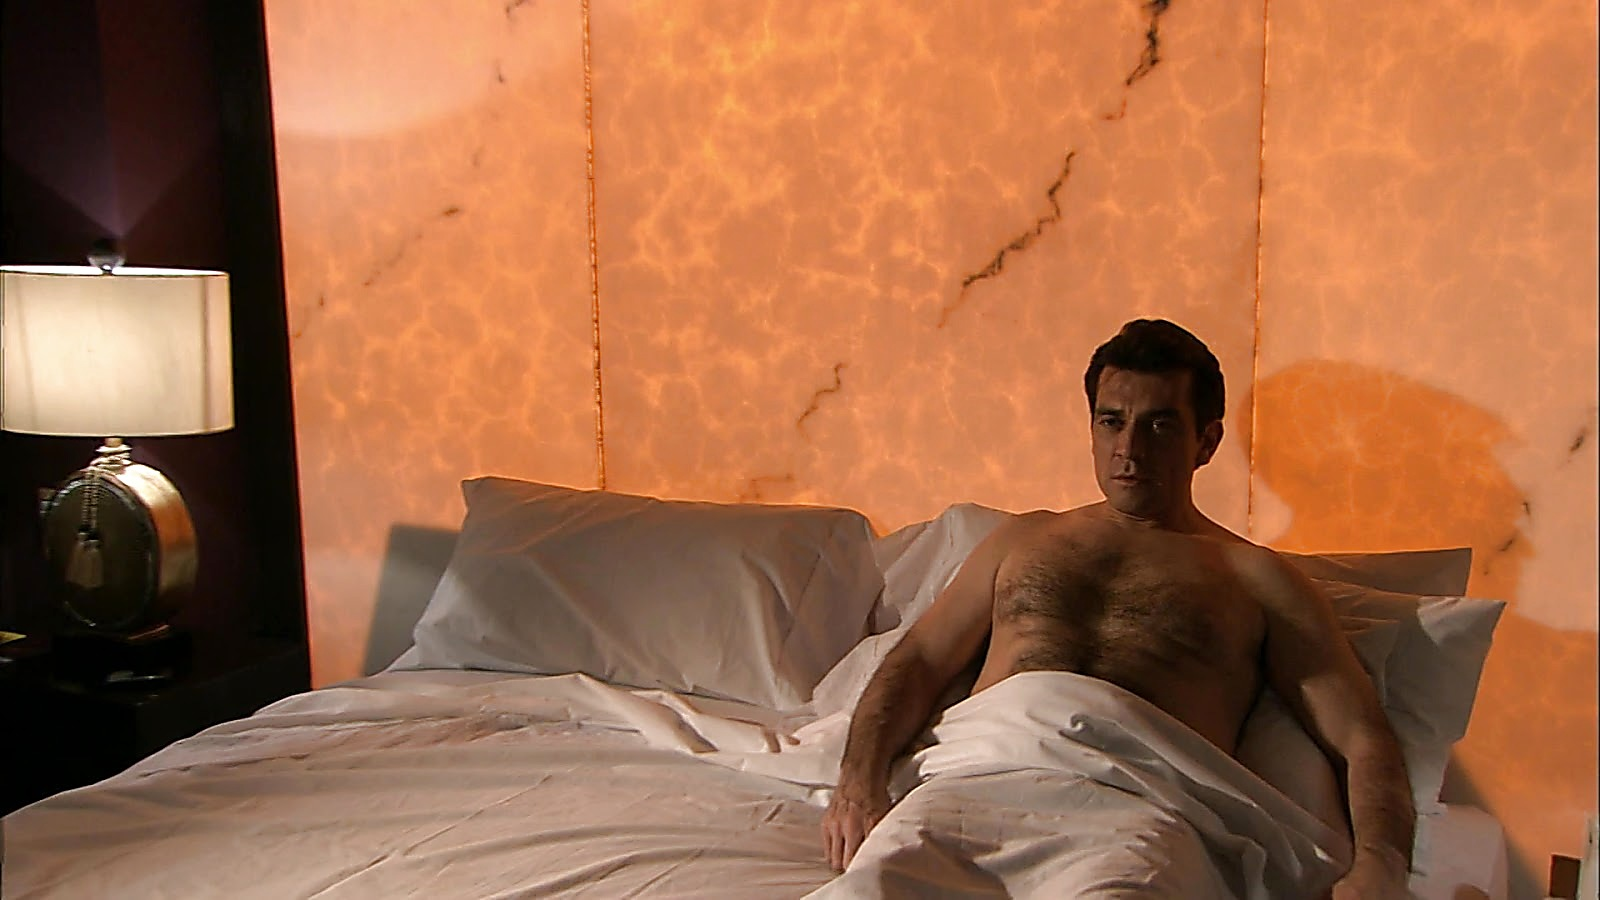 Jorge Salinas sexy shirtless scene February 23, 2020, 1pm